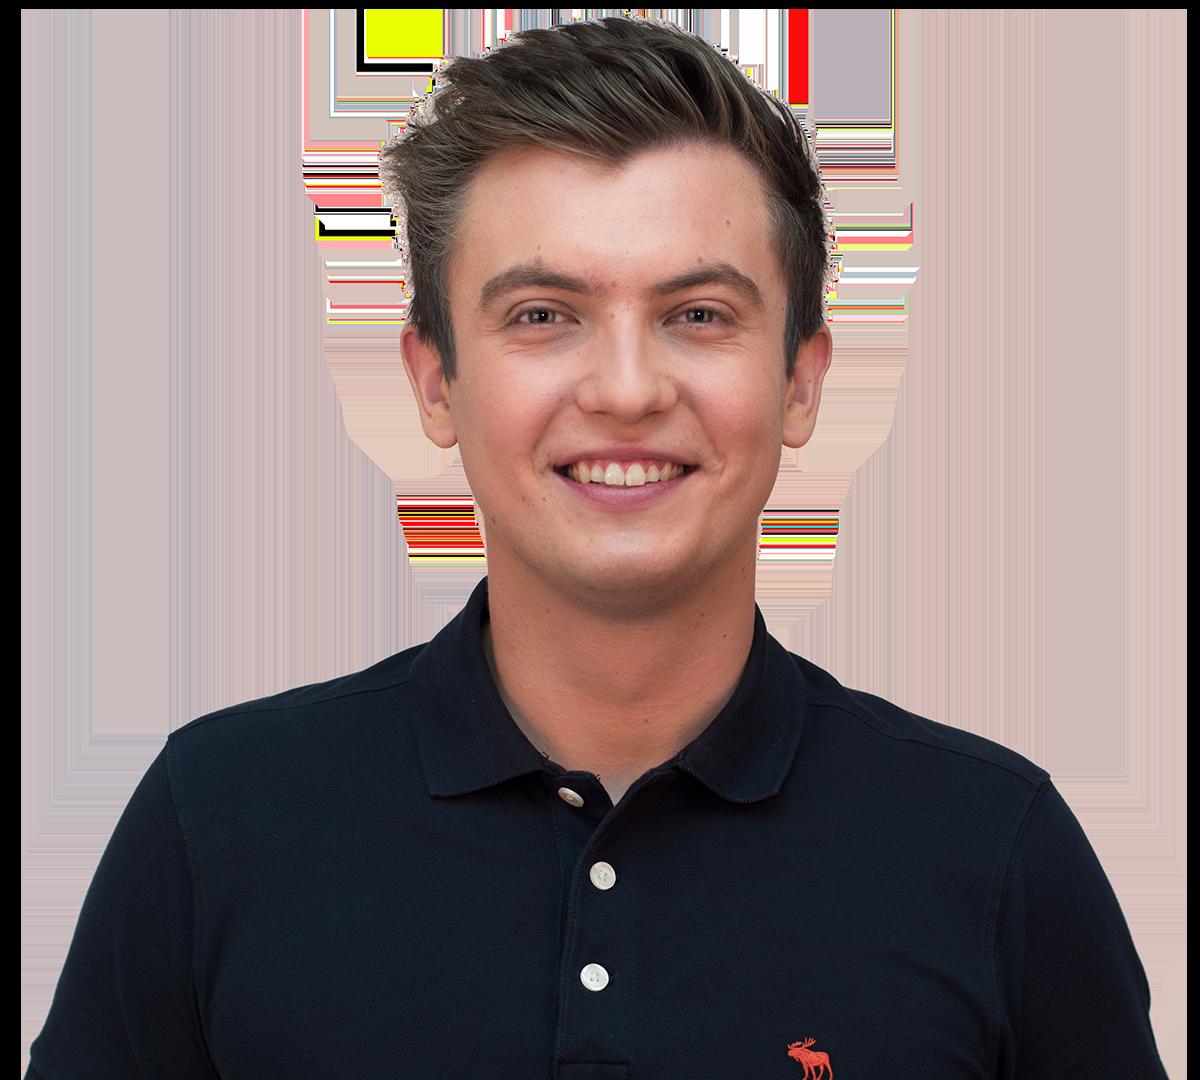 James' avatar